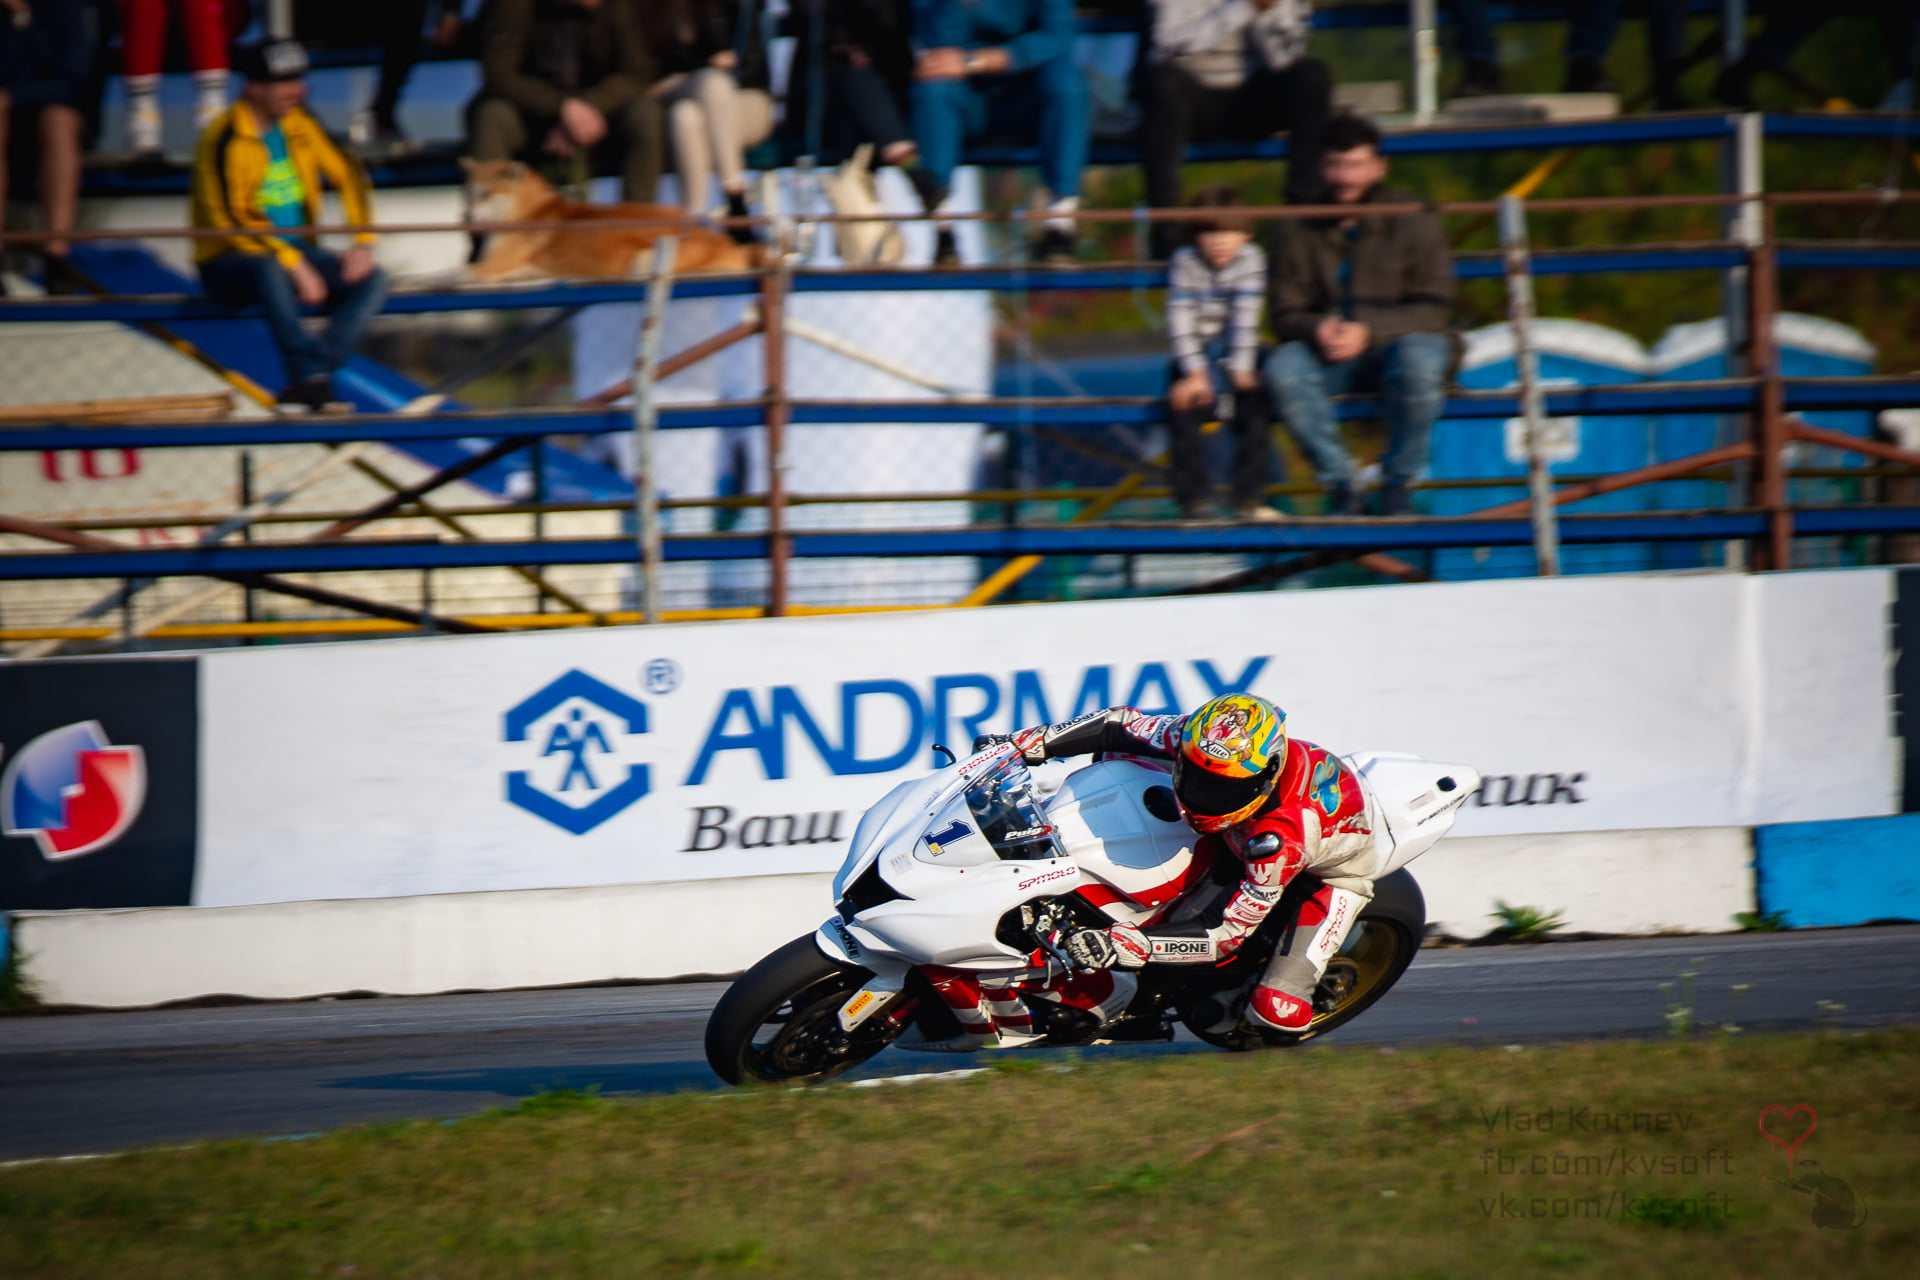 5-6_etap_MotoGPUkraine_025